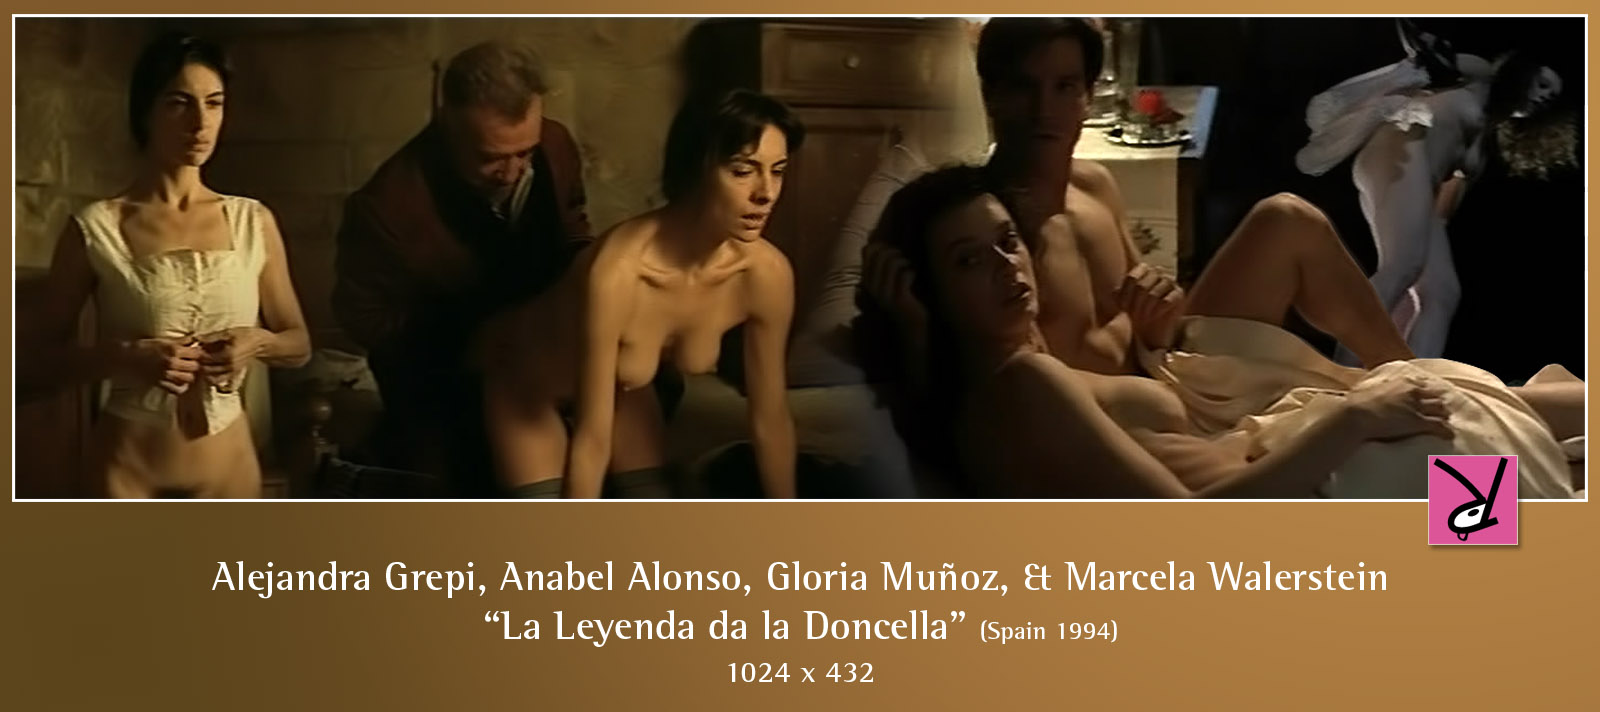 Alejandra grepi la leyenda da la doncella - 2 part 2